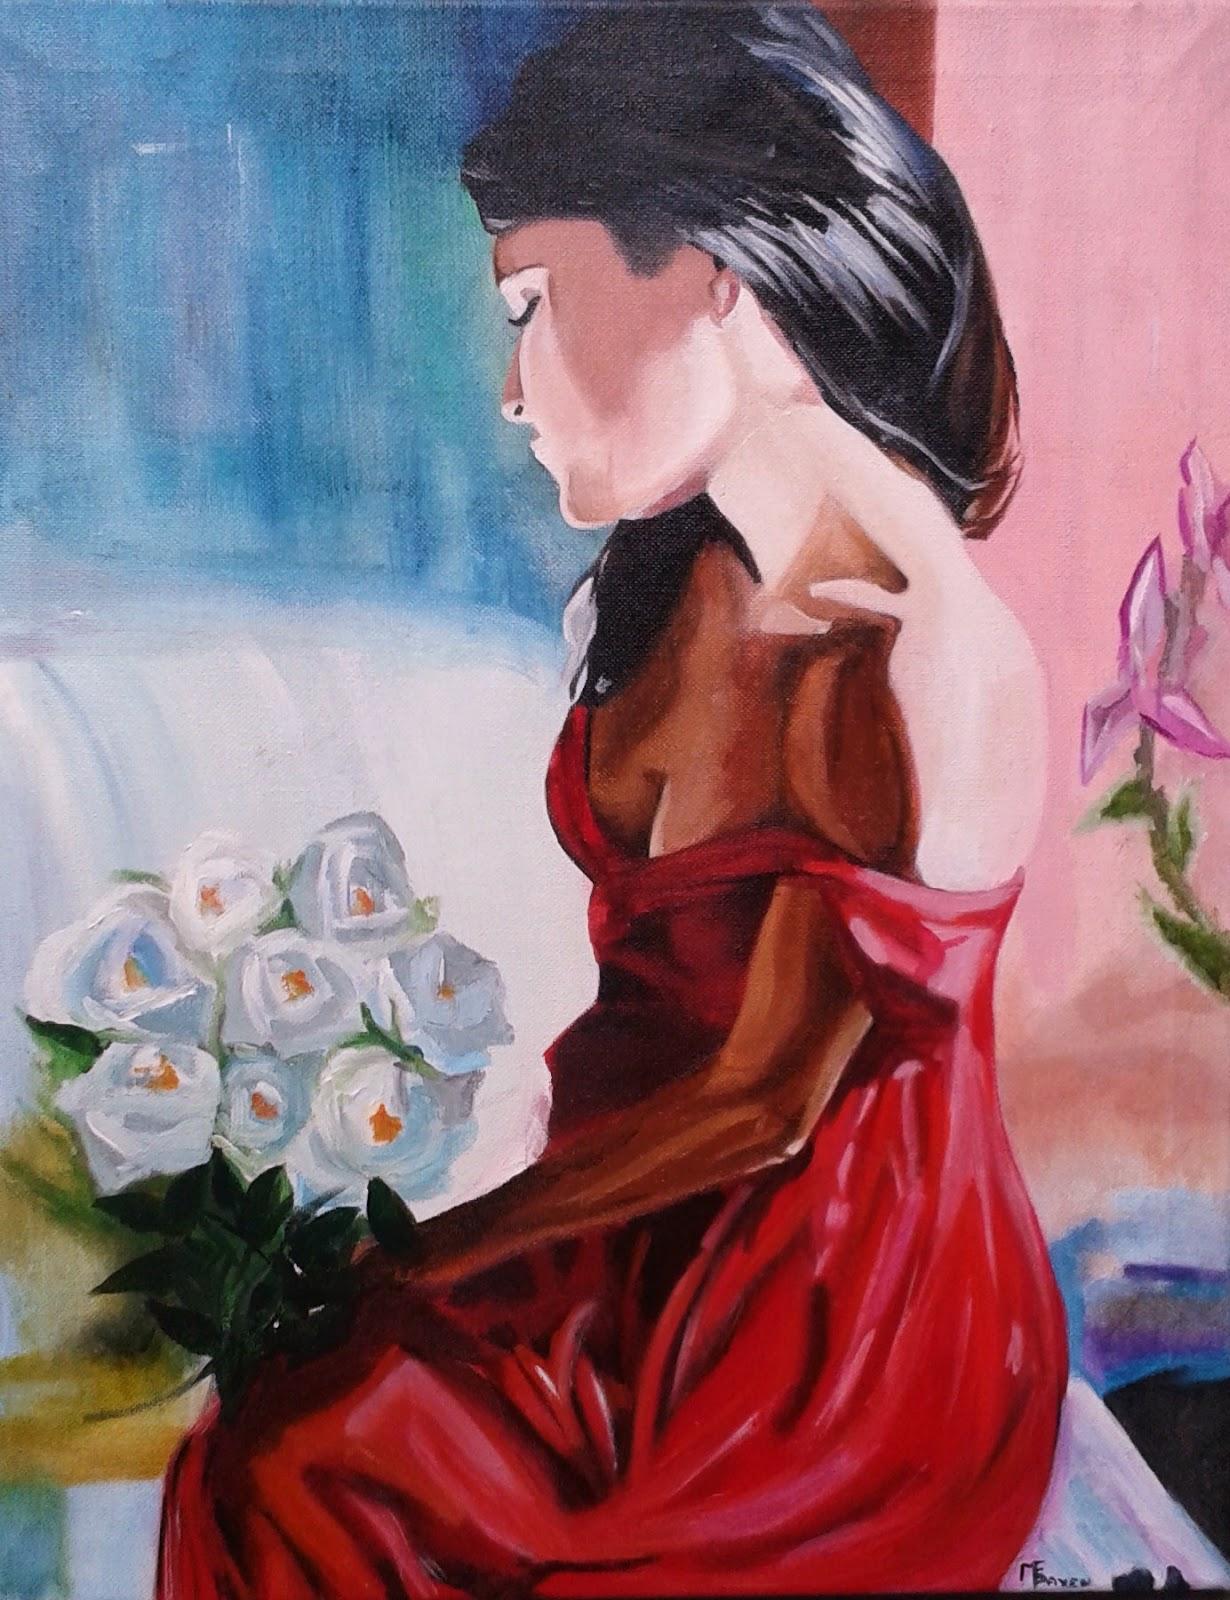 Mujer Pintura Mujer F0wqt80z Rojo Pintura Vestido g6y7vYbf